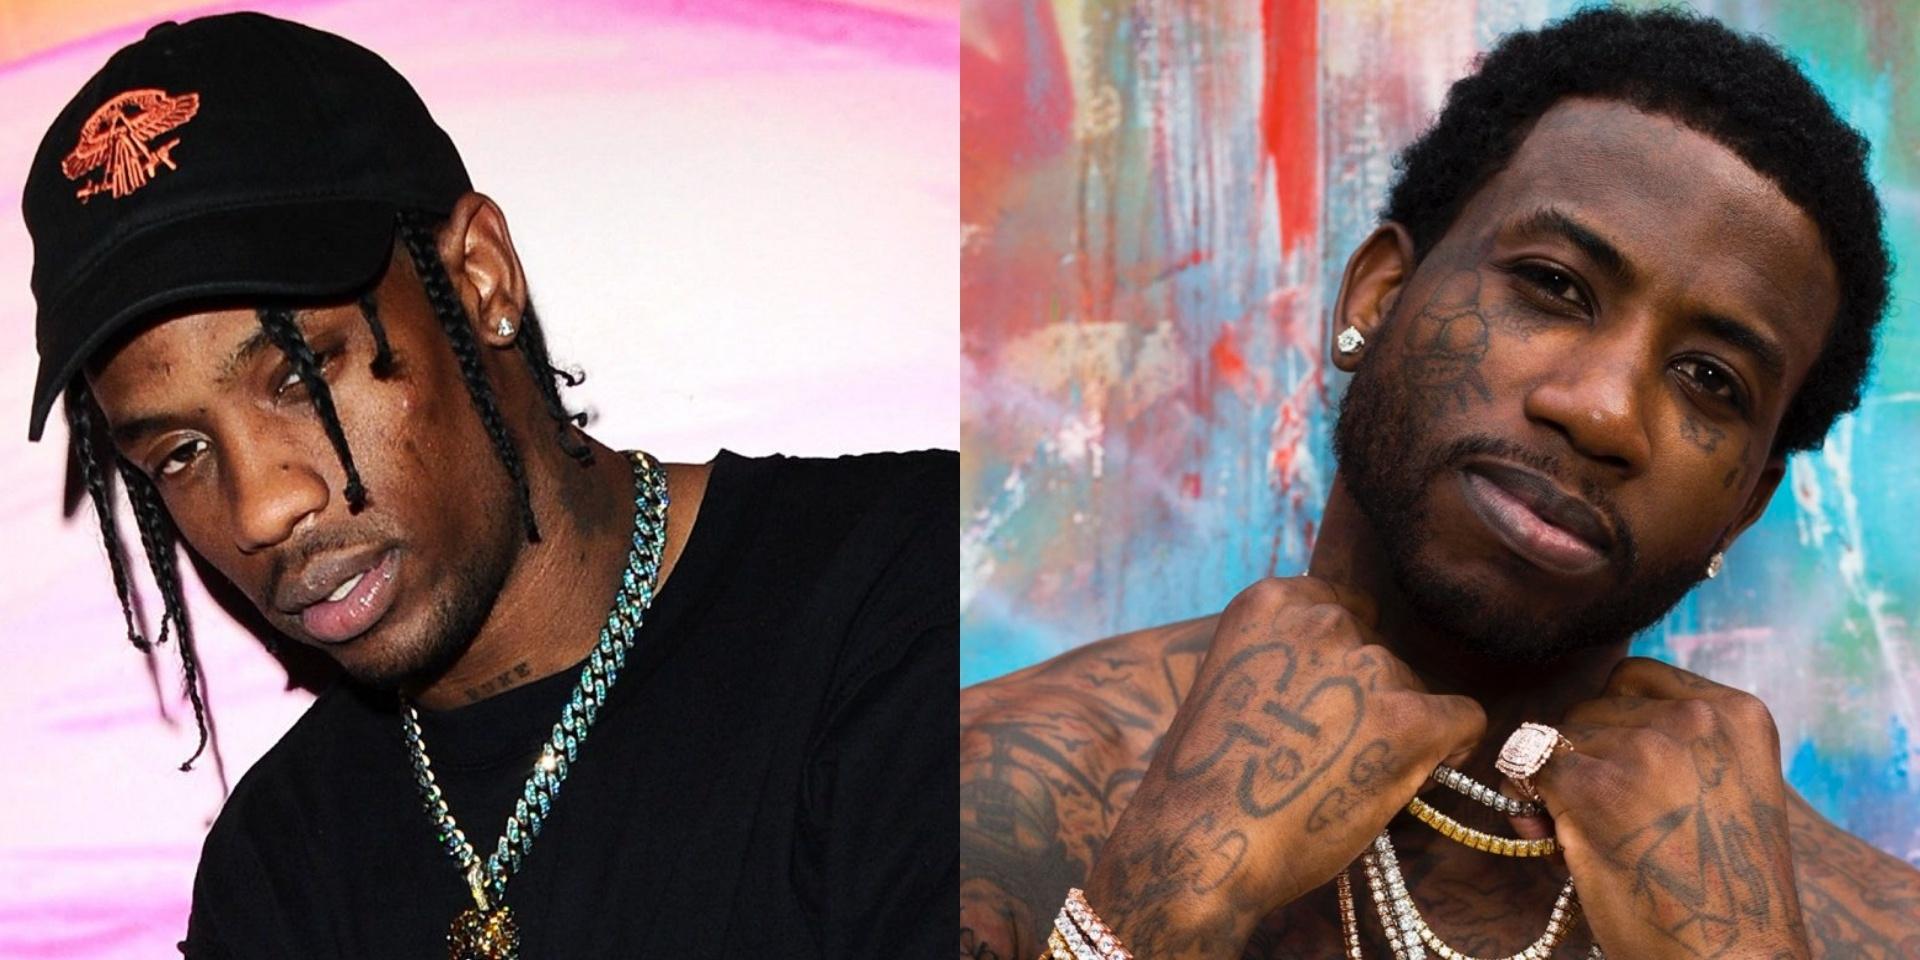 Travis Scott premiered unreleased track 'Murda' with Gucci Mane